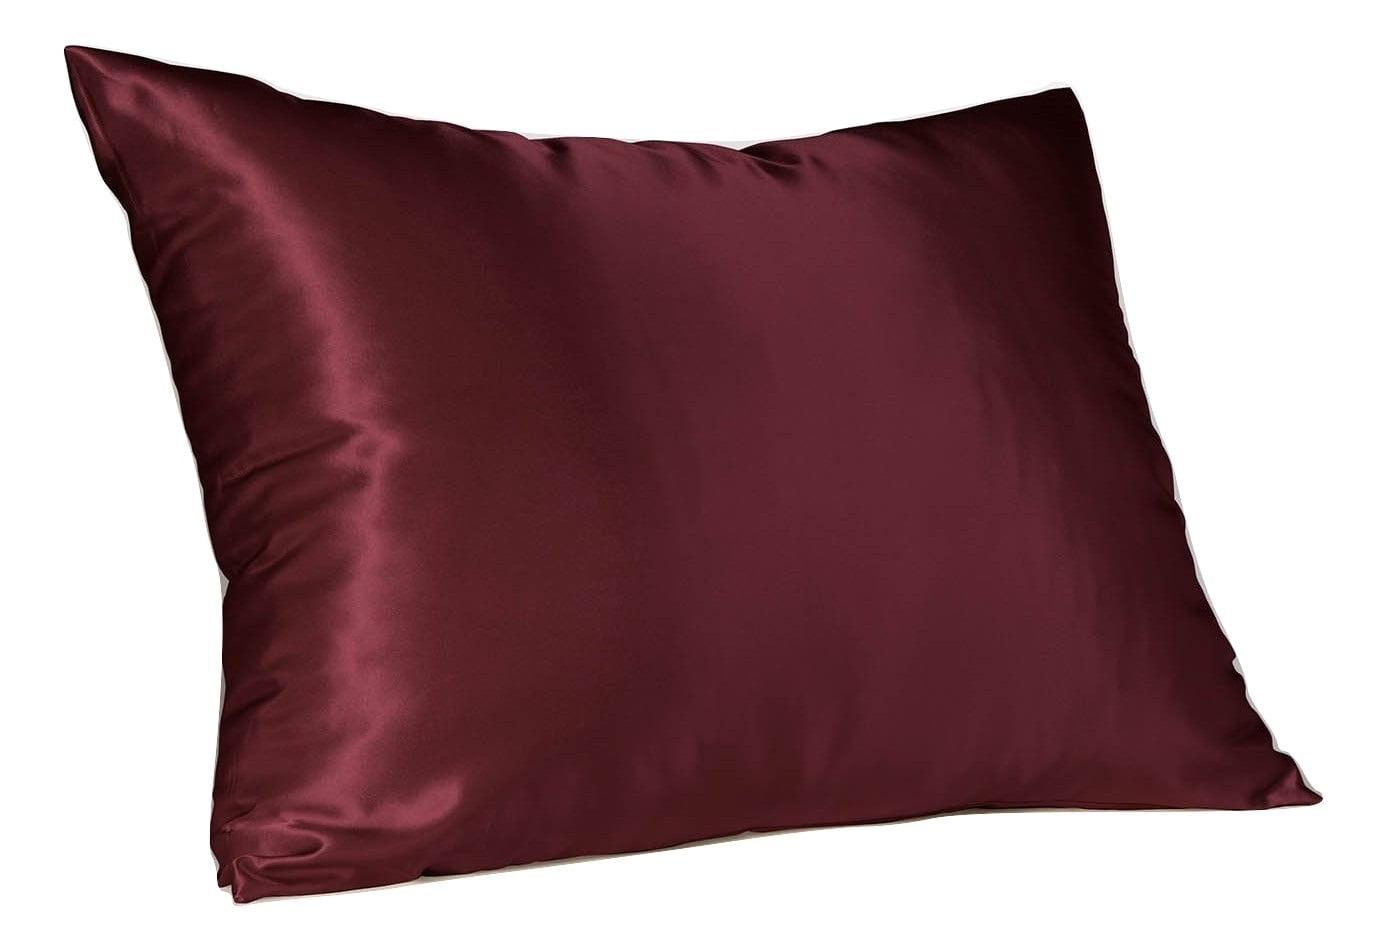 Sweet Dreams Luxury Satin Pillowcase With Zipper Silky